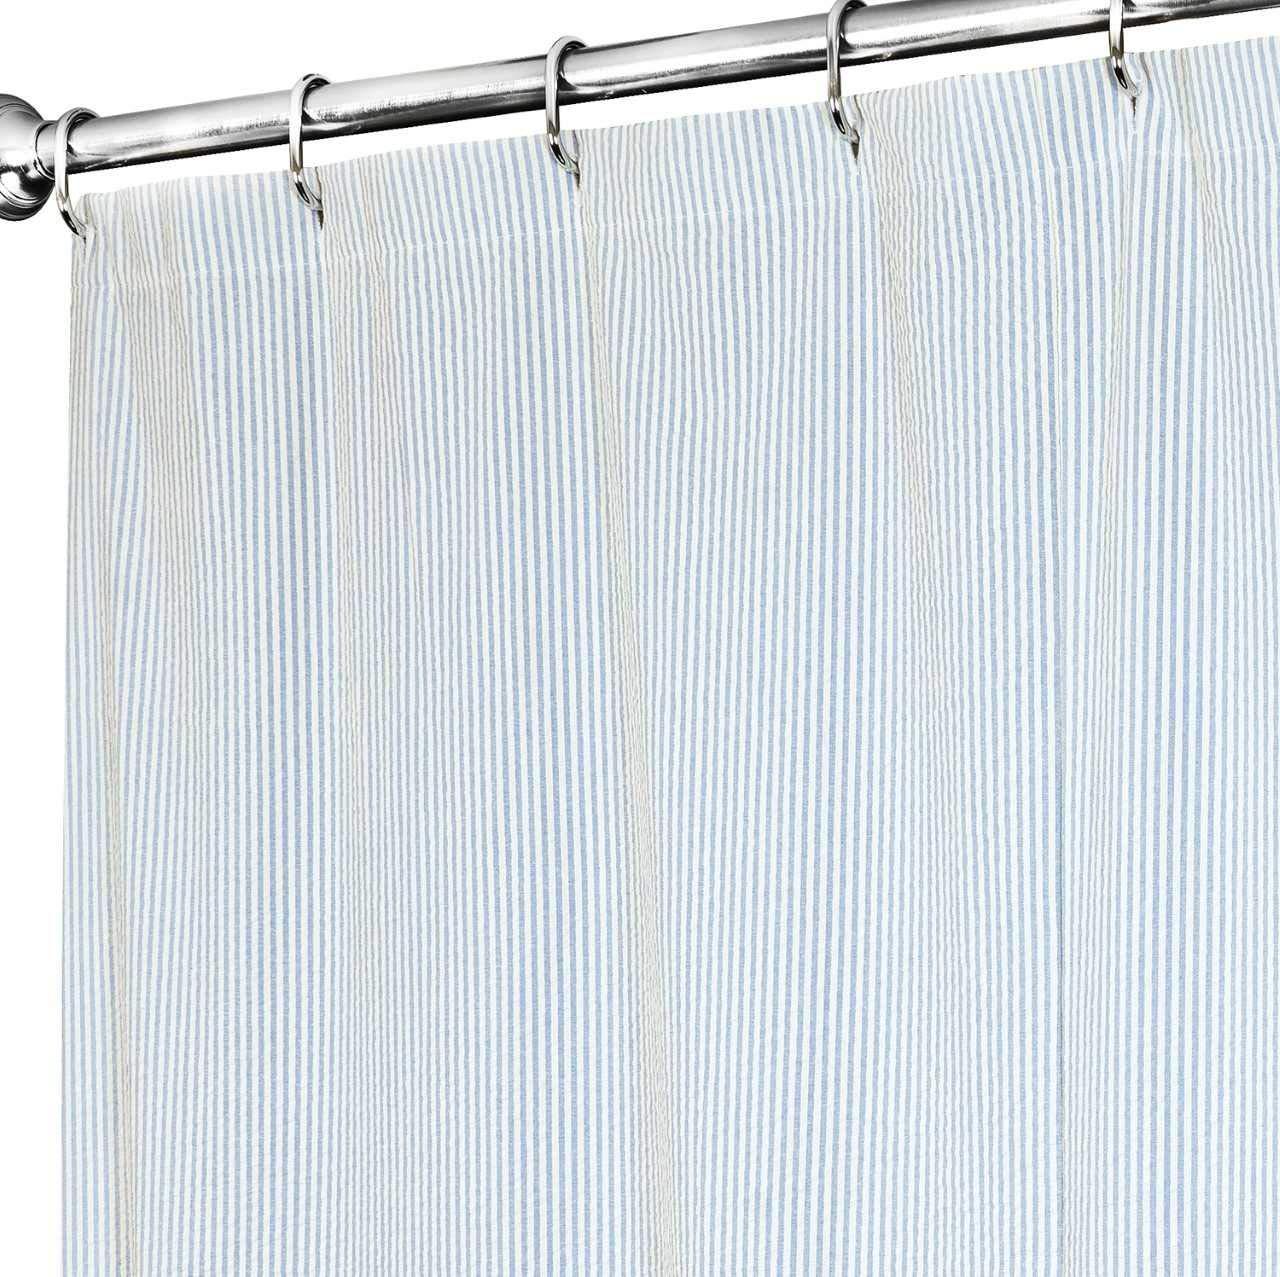 Extra Long Shower Curtain 72 x 84 Inch Shower Curtains for Bathroom Decor- Fabric Shower Curtain Blue Striped Seersucker Beach Shower Curtain for Beach House Decor